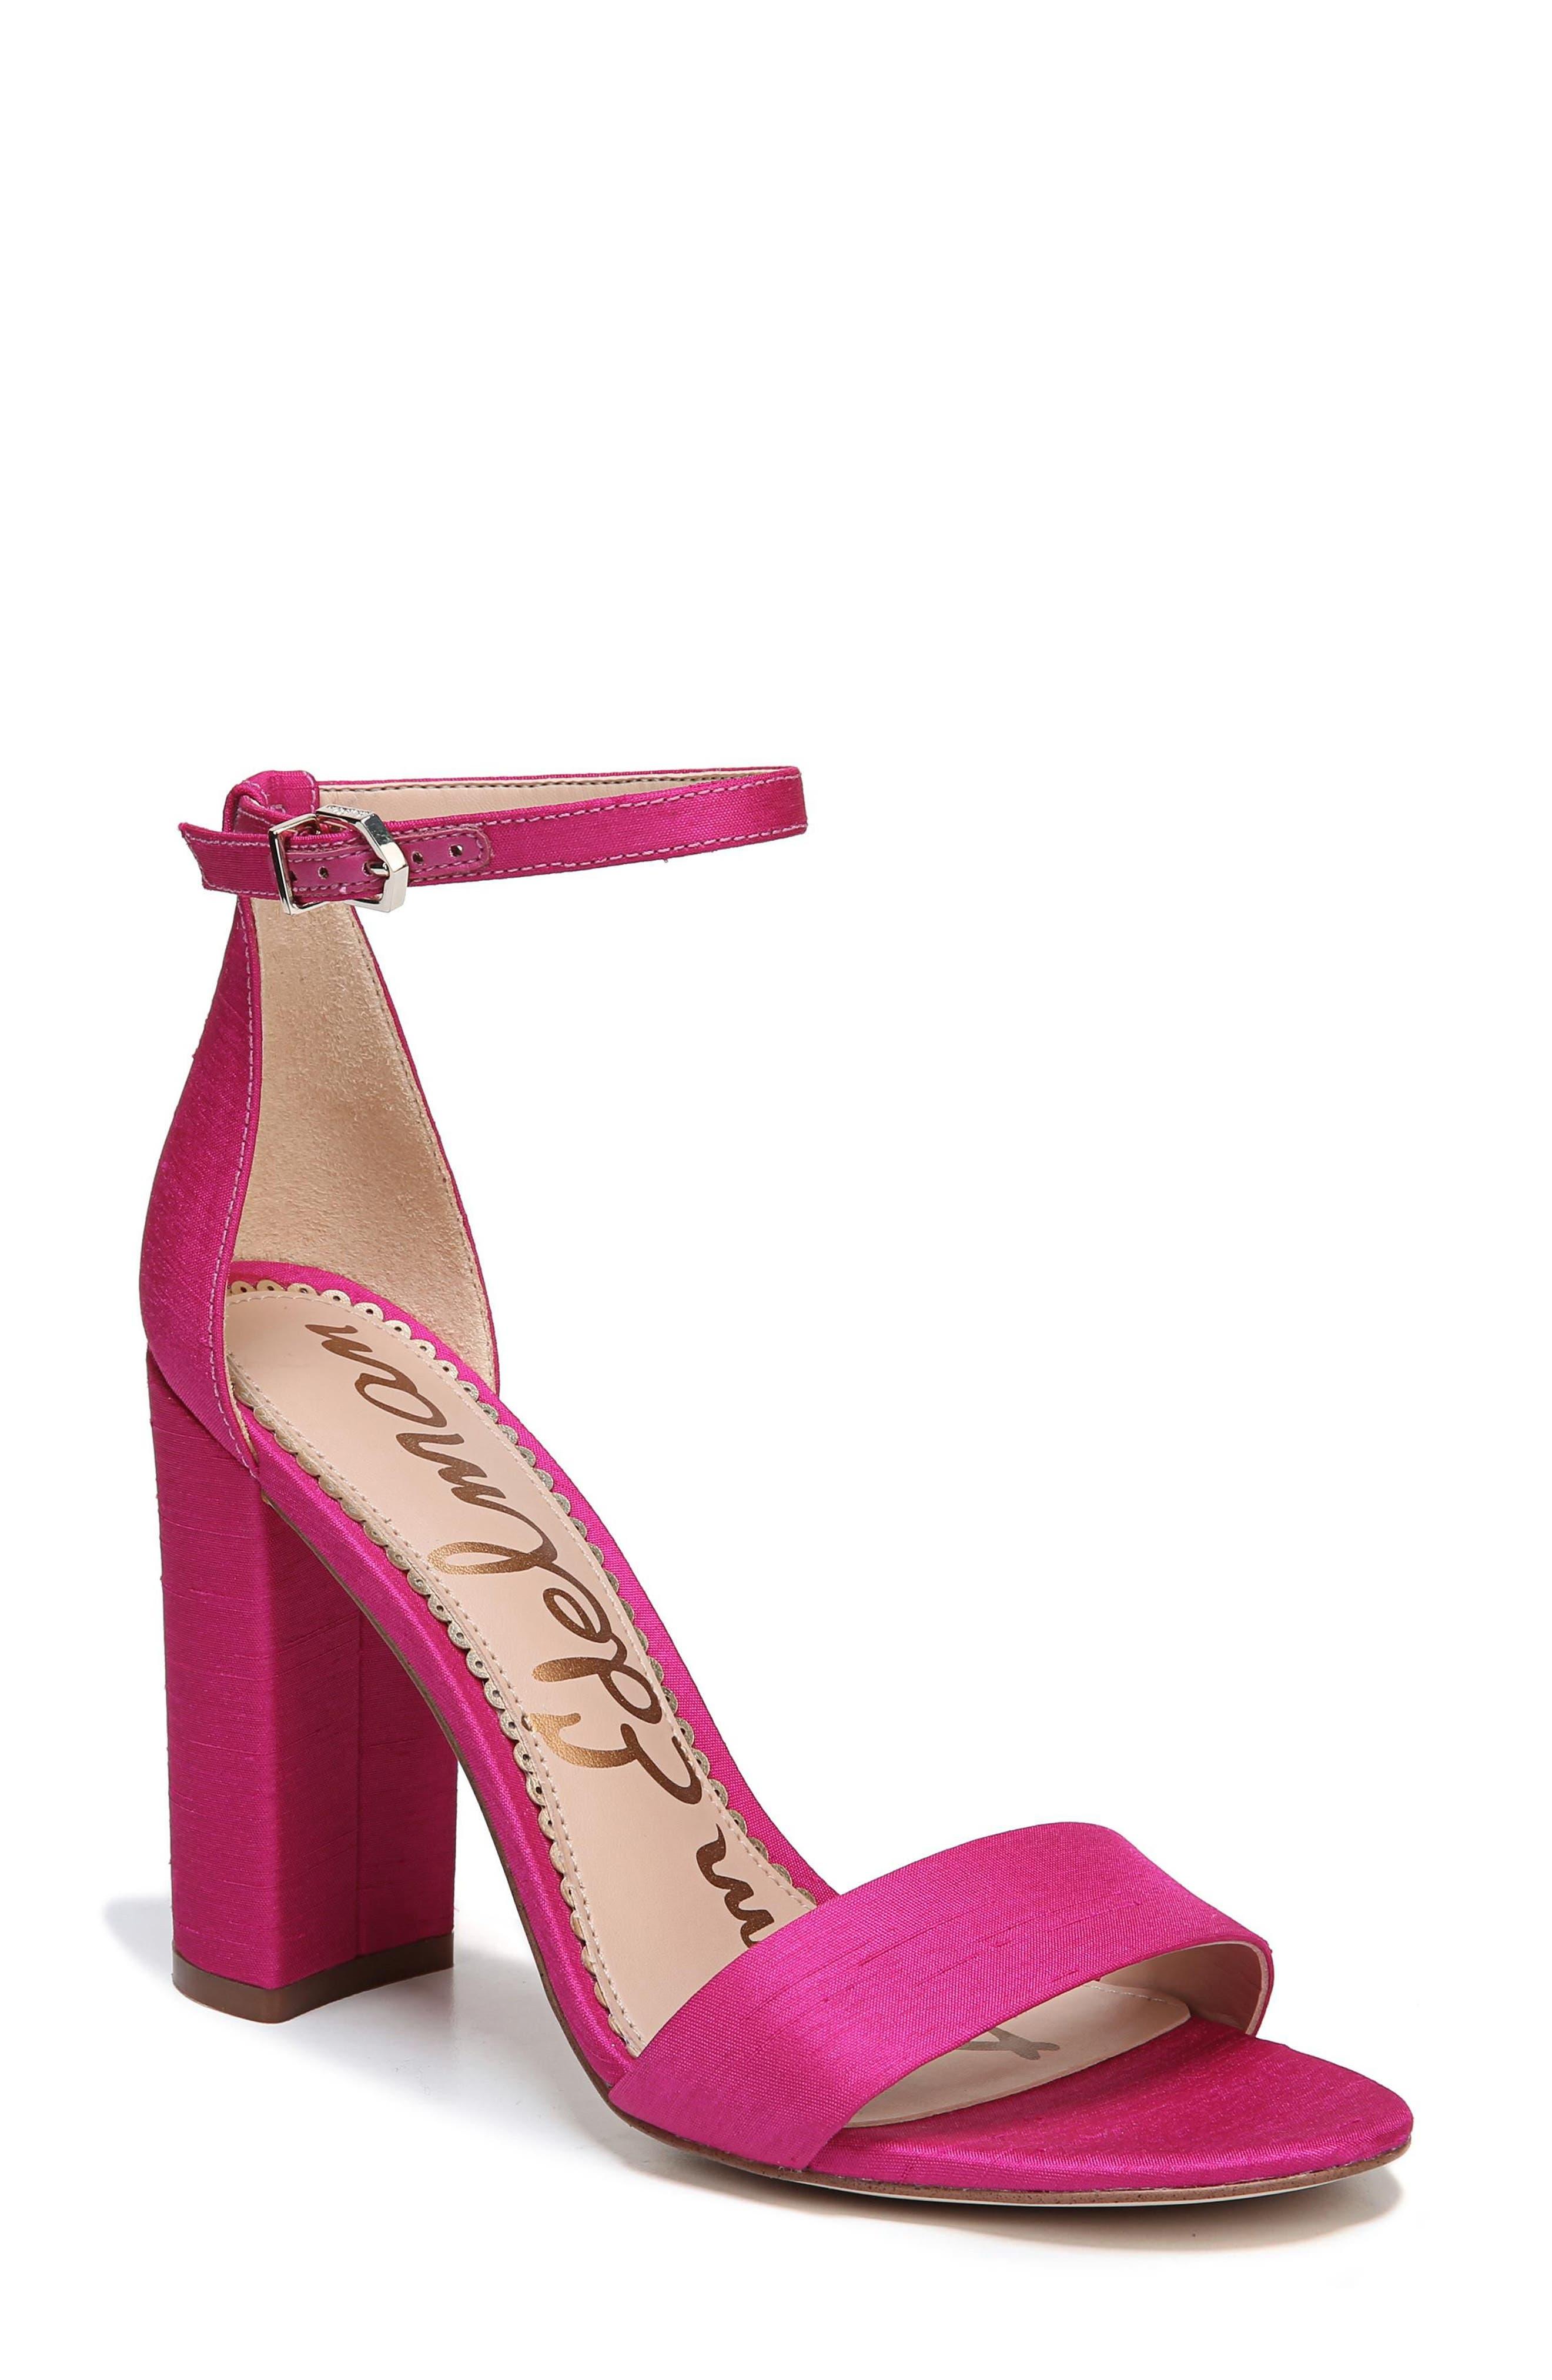 Main Image - Sam Edelman Yaro Ankle Strap Sandal (Women)